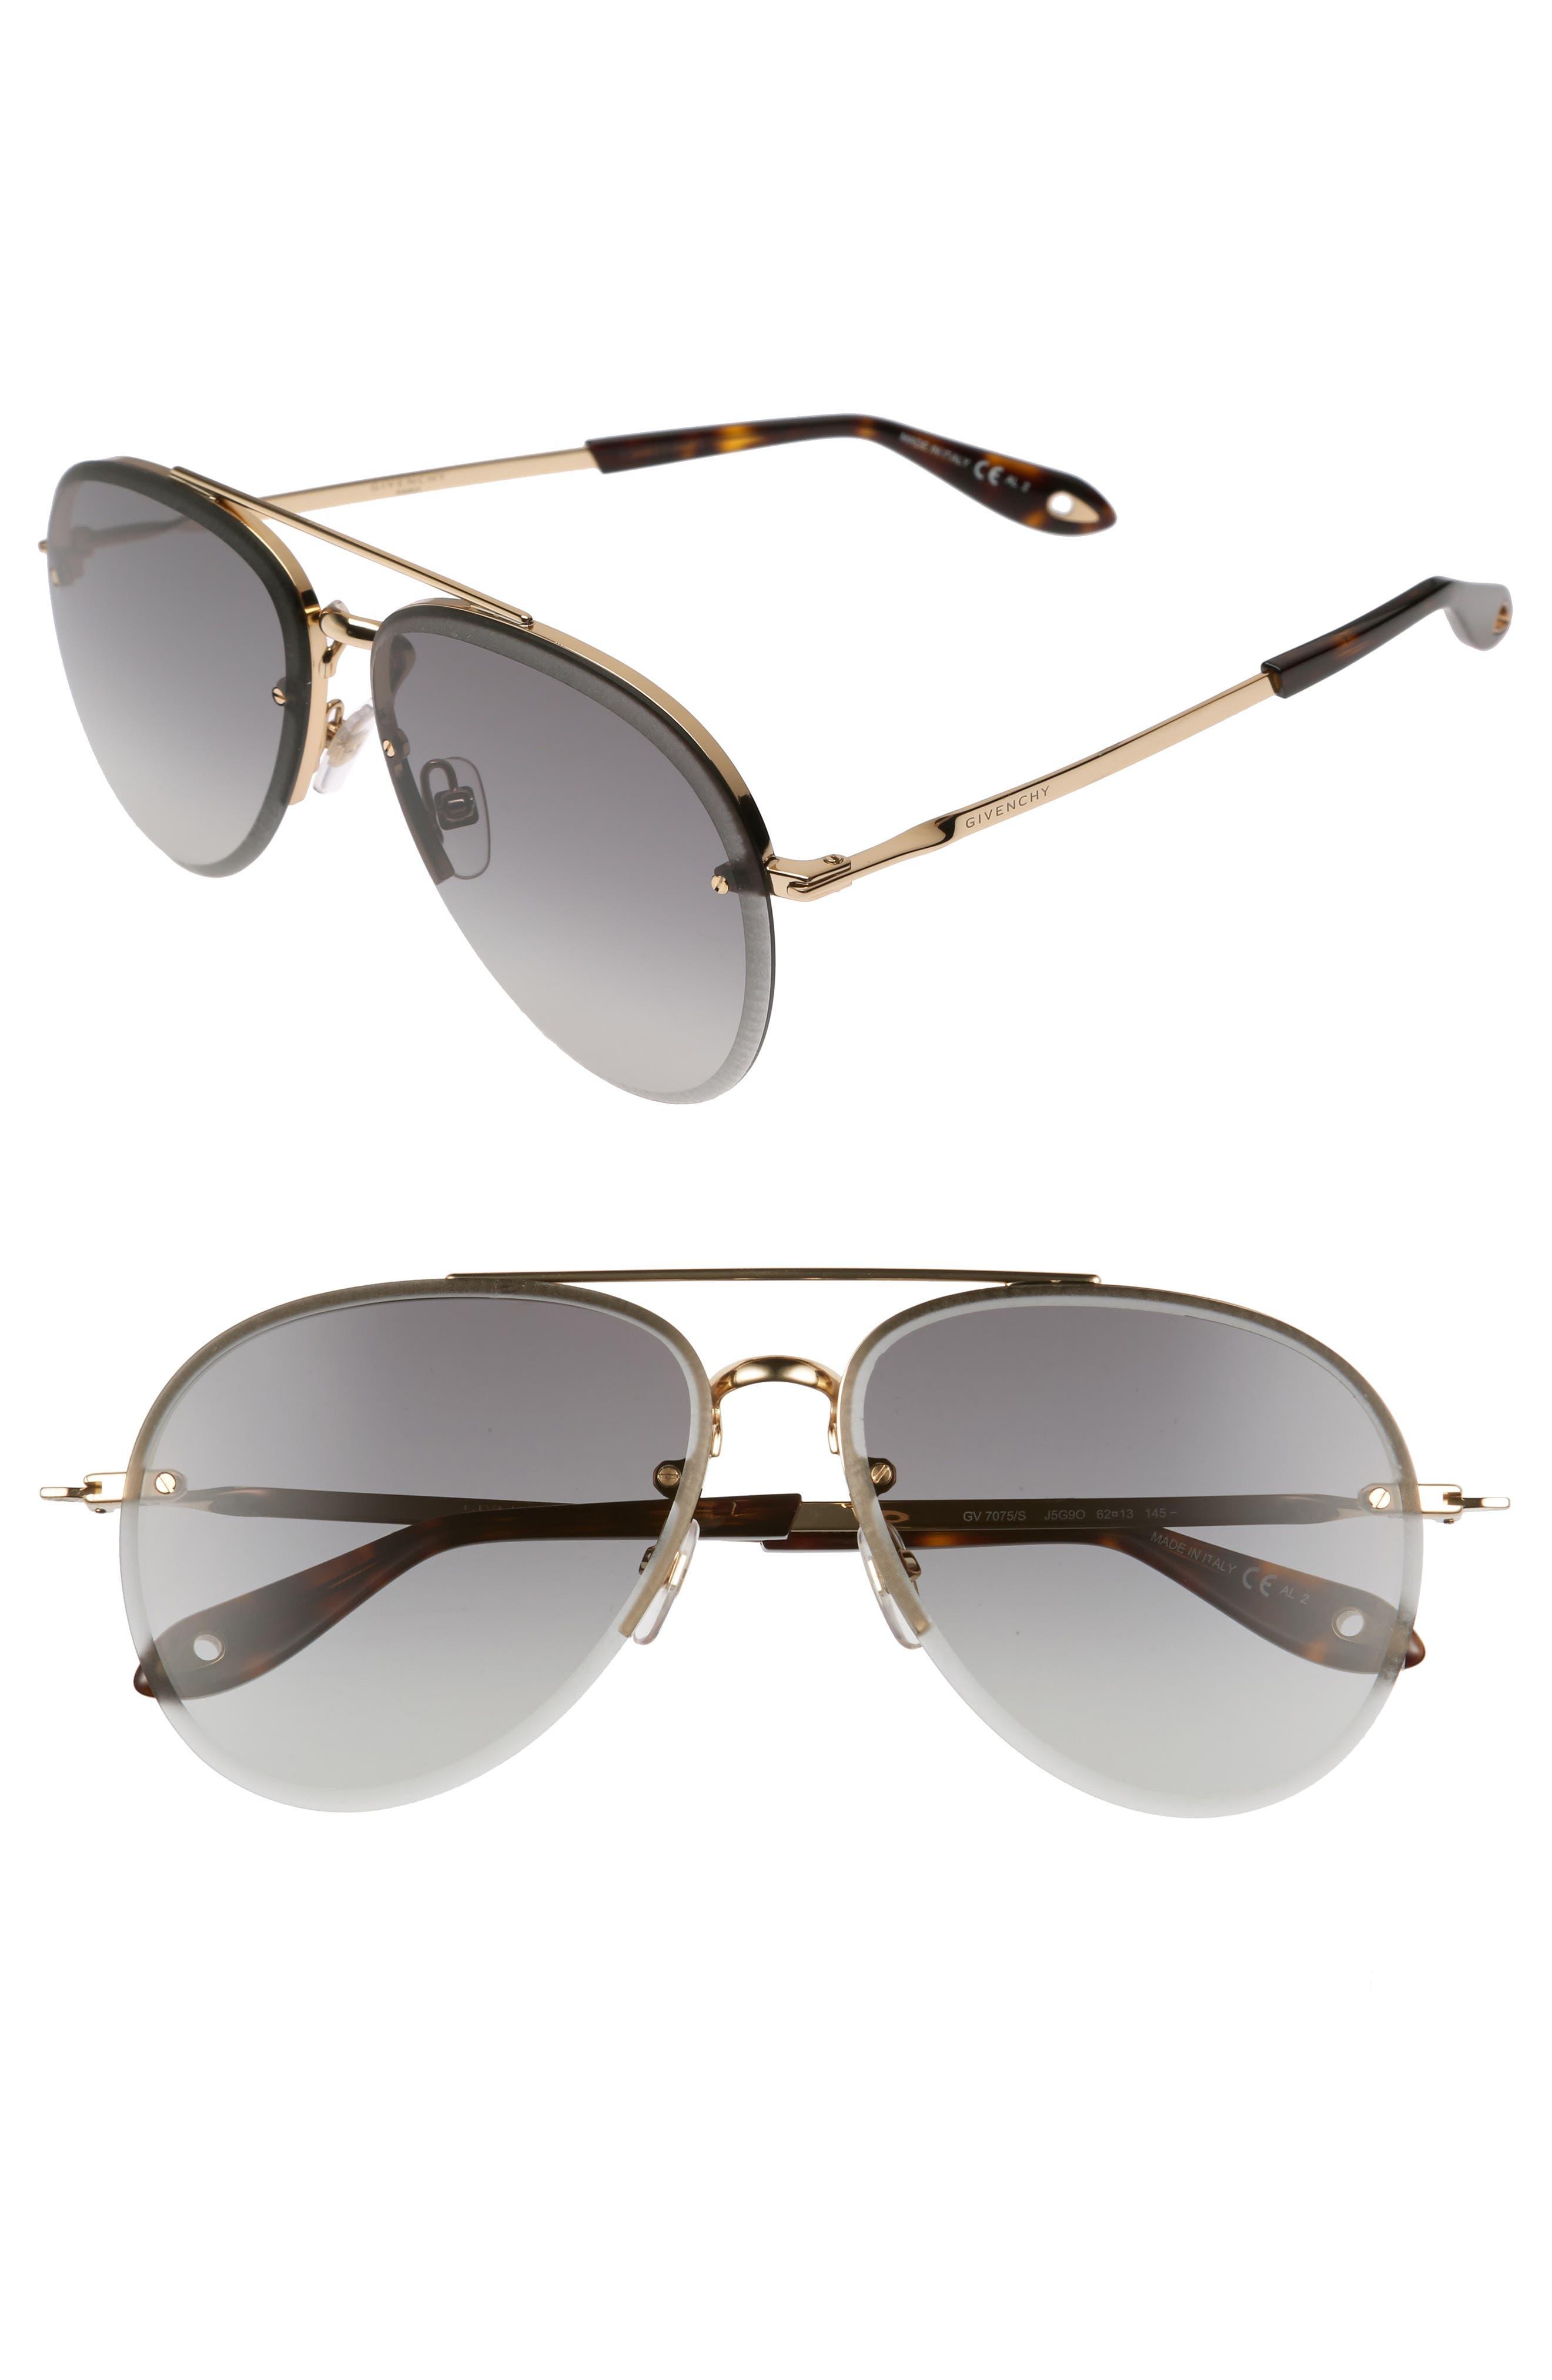 Givenchy 62mm Oversize Aviator Sunglasses